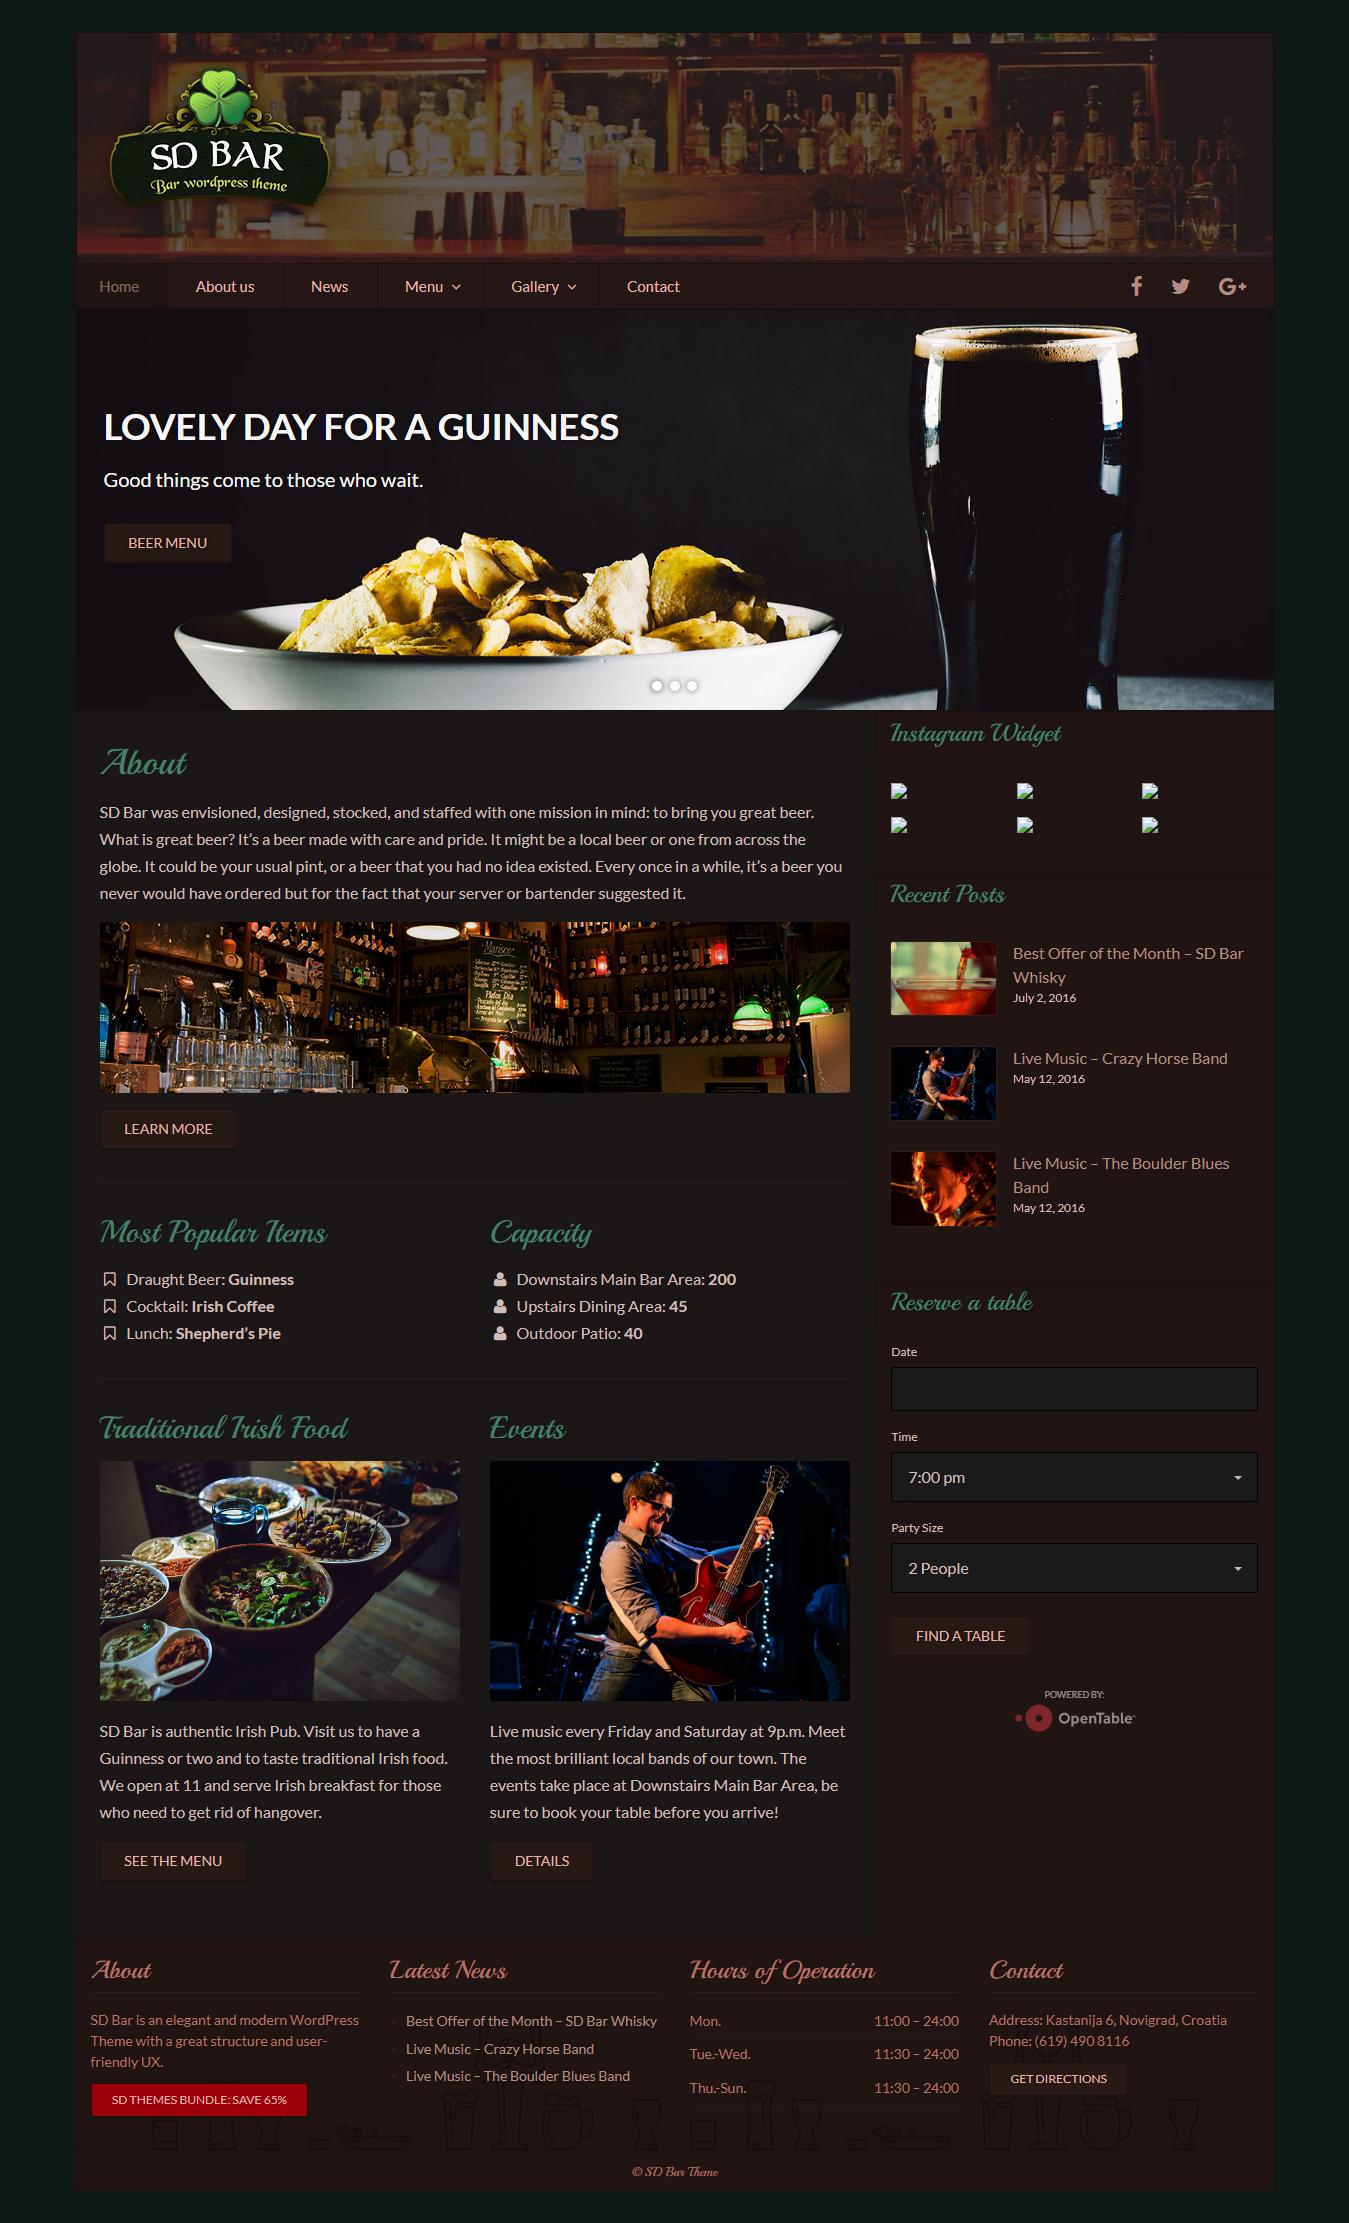 sd bar best premium bar pub wordpress theme - 10+ Best Premium Bar and Pub WordPress Themes